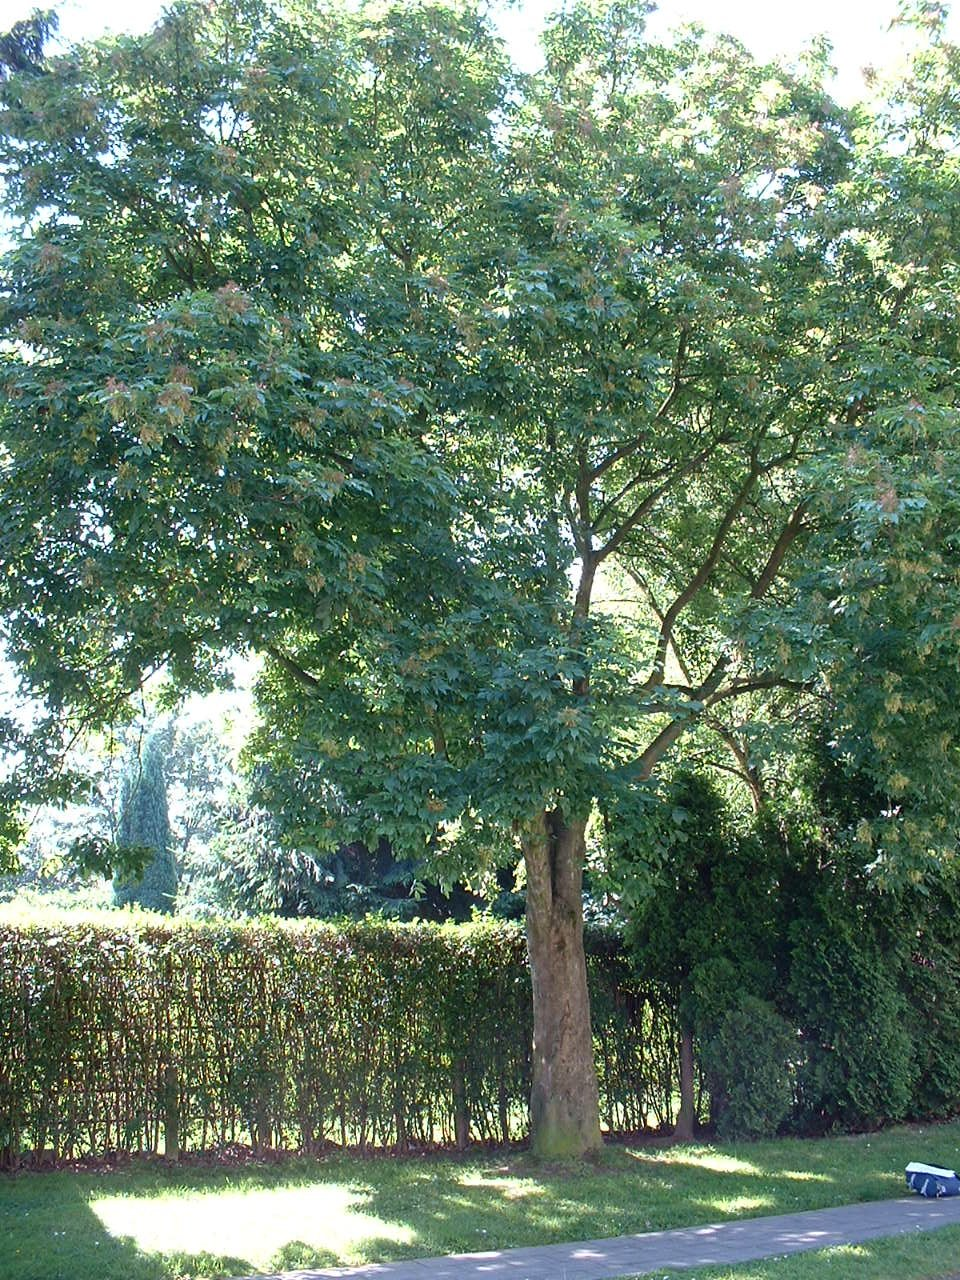 Frêne à fleurs/plumeux – Evere, Quartier Tornooiveld, Avenue de l'Ecu –  17 Juin 2002